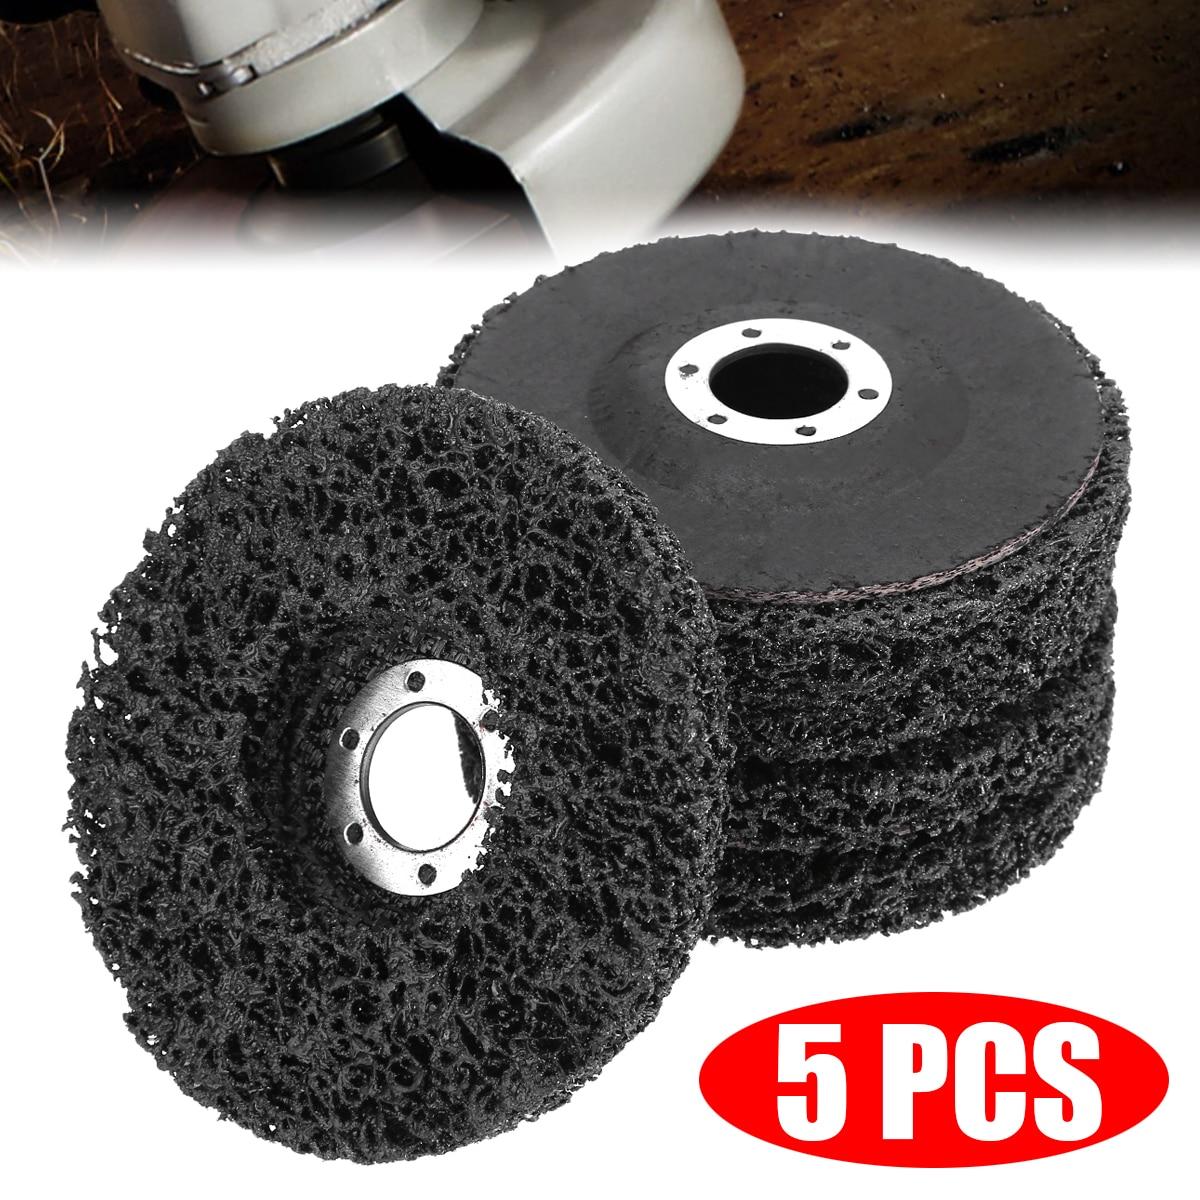 5Pcs 40Grit Poly Strip Grinder Wheel Disc Metal Surface Polishing Wheel Paint Rust Removal Clean Abrasive Wheel Tool 115*22mm